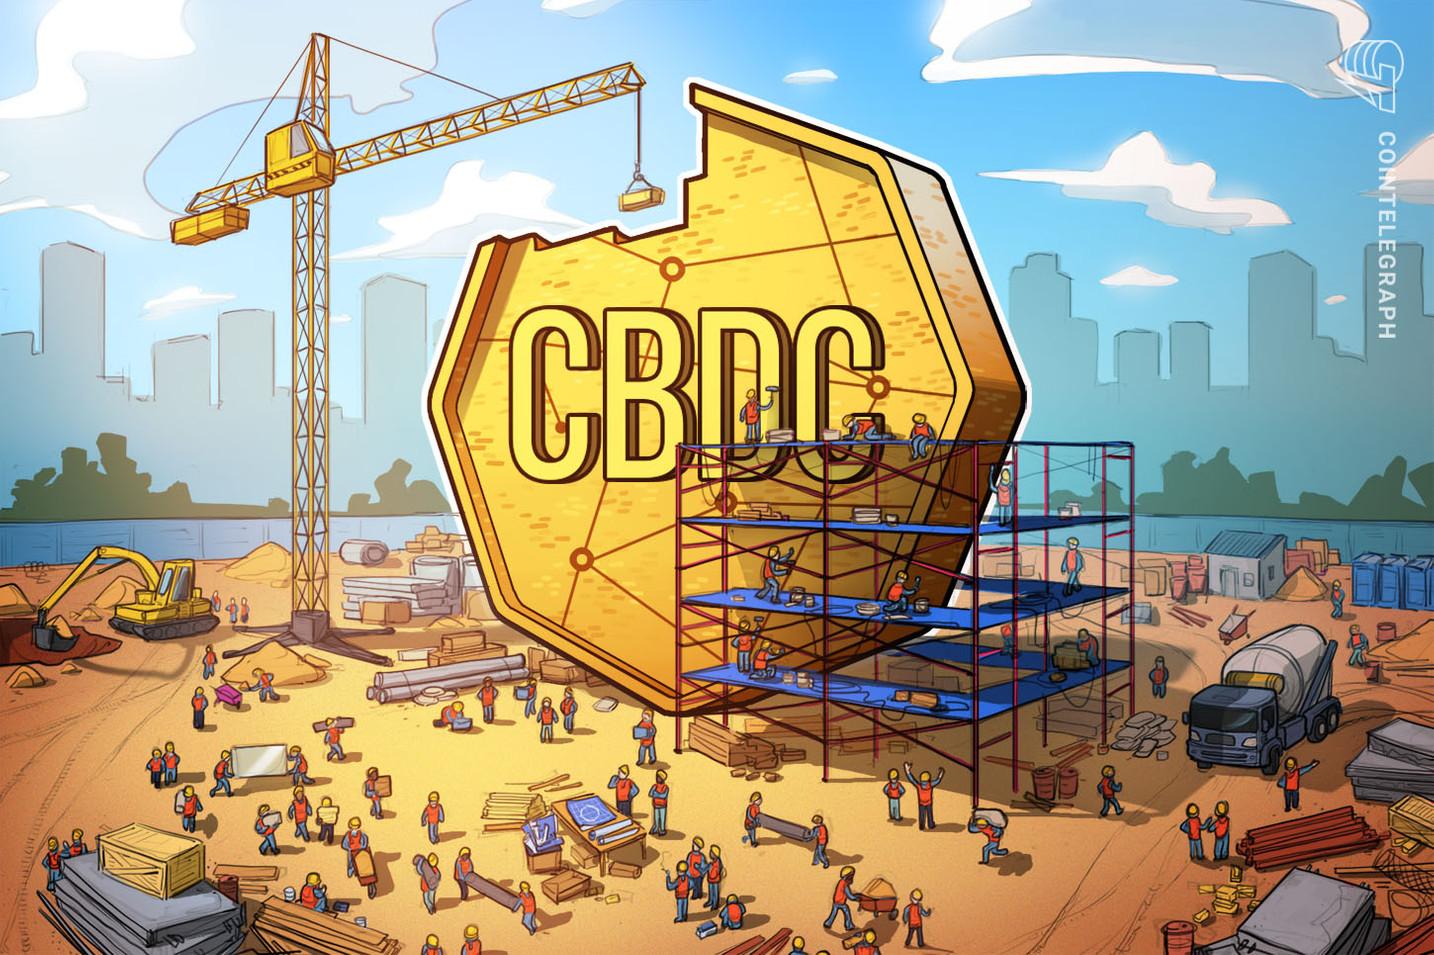 CBDCを使った国際決済をテスト=オーストラリア、シンガポール、マレーシア、南アフリカの4ヵ国